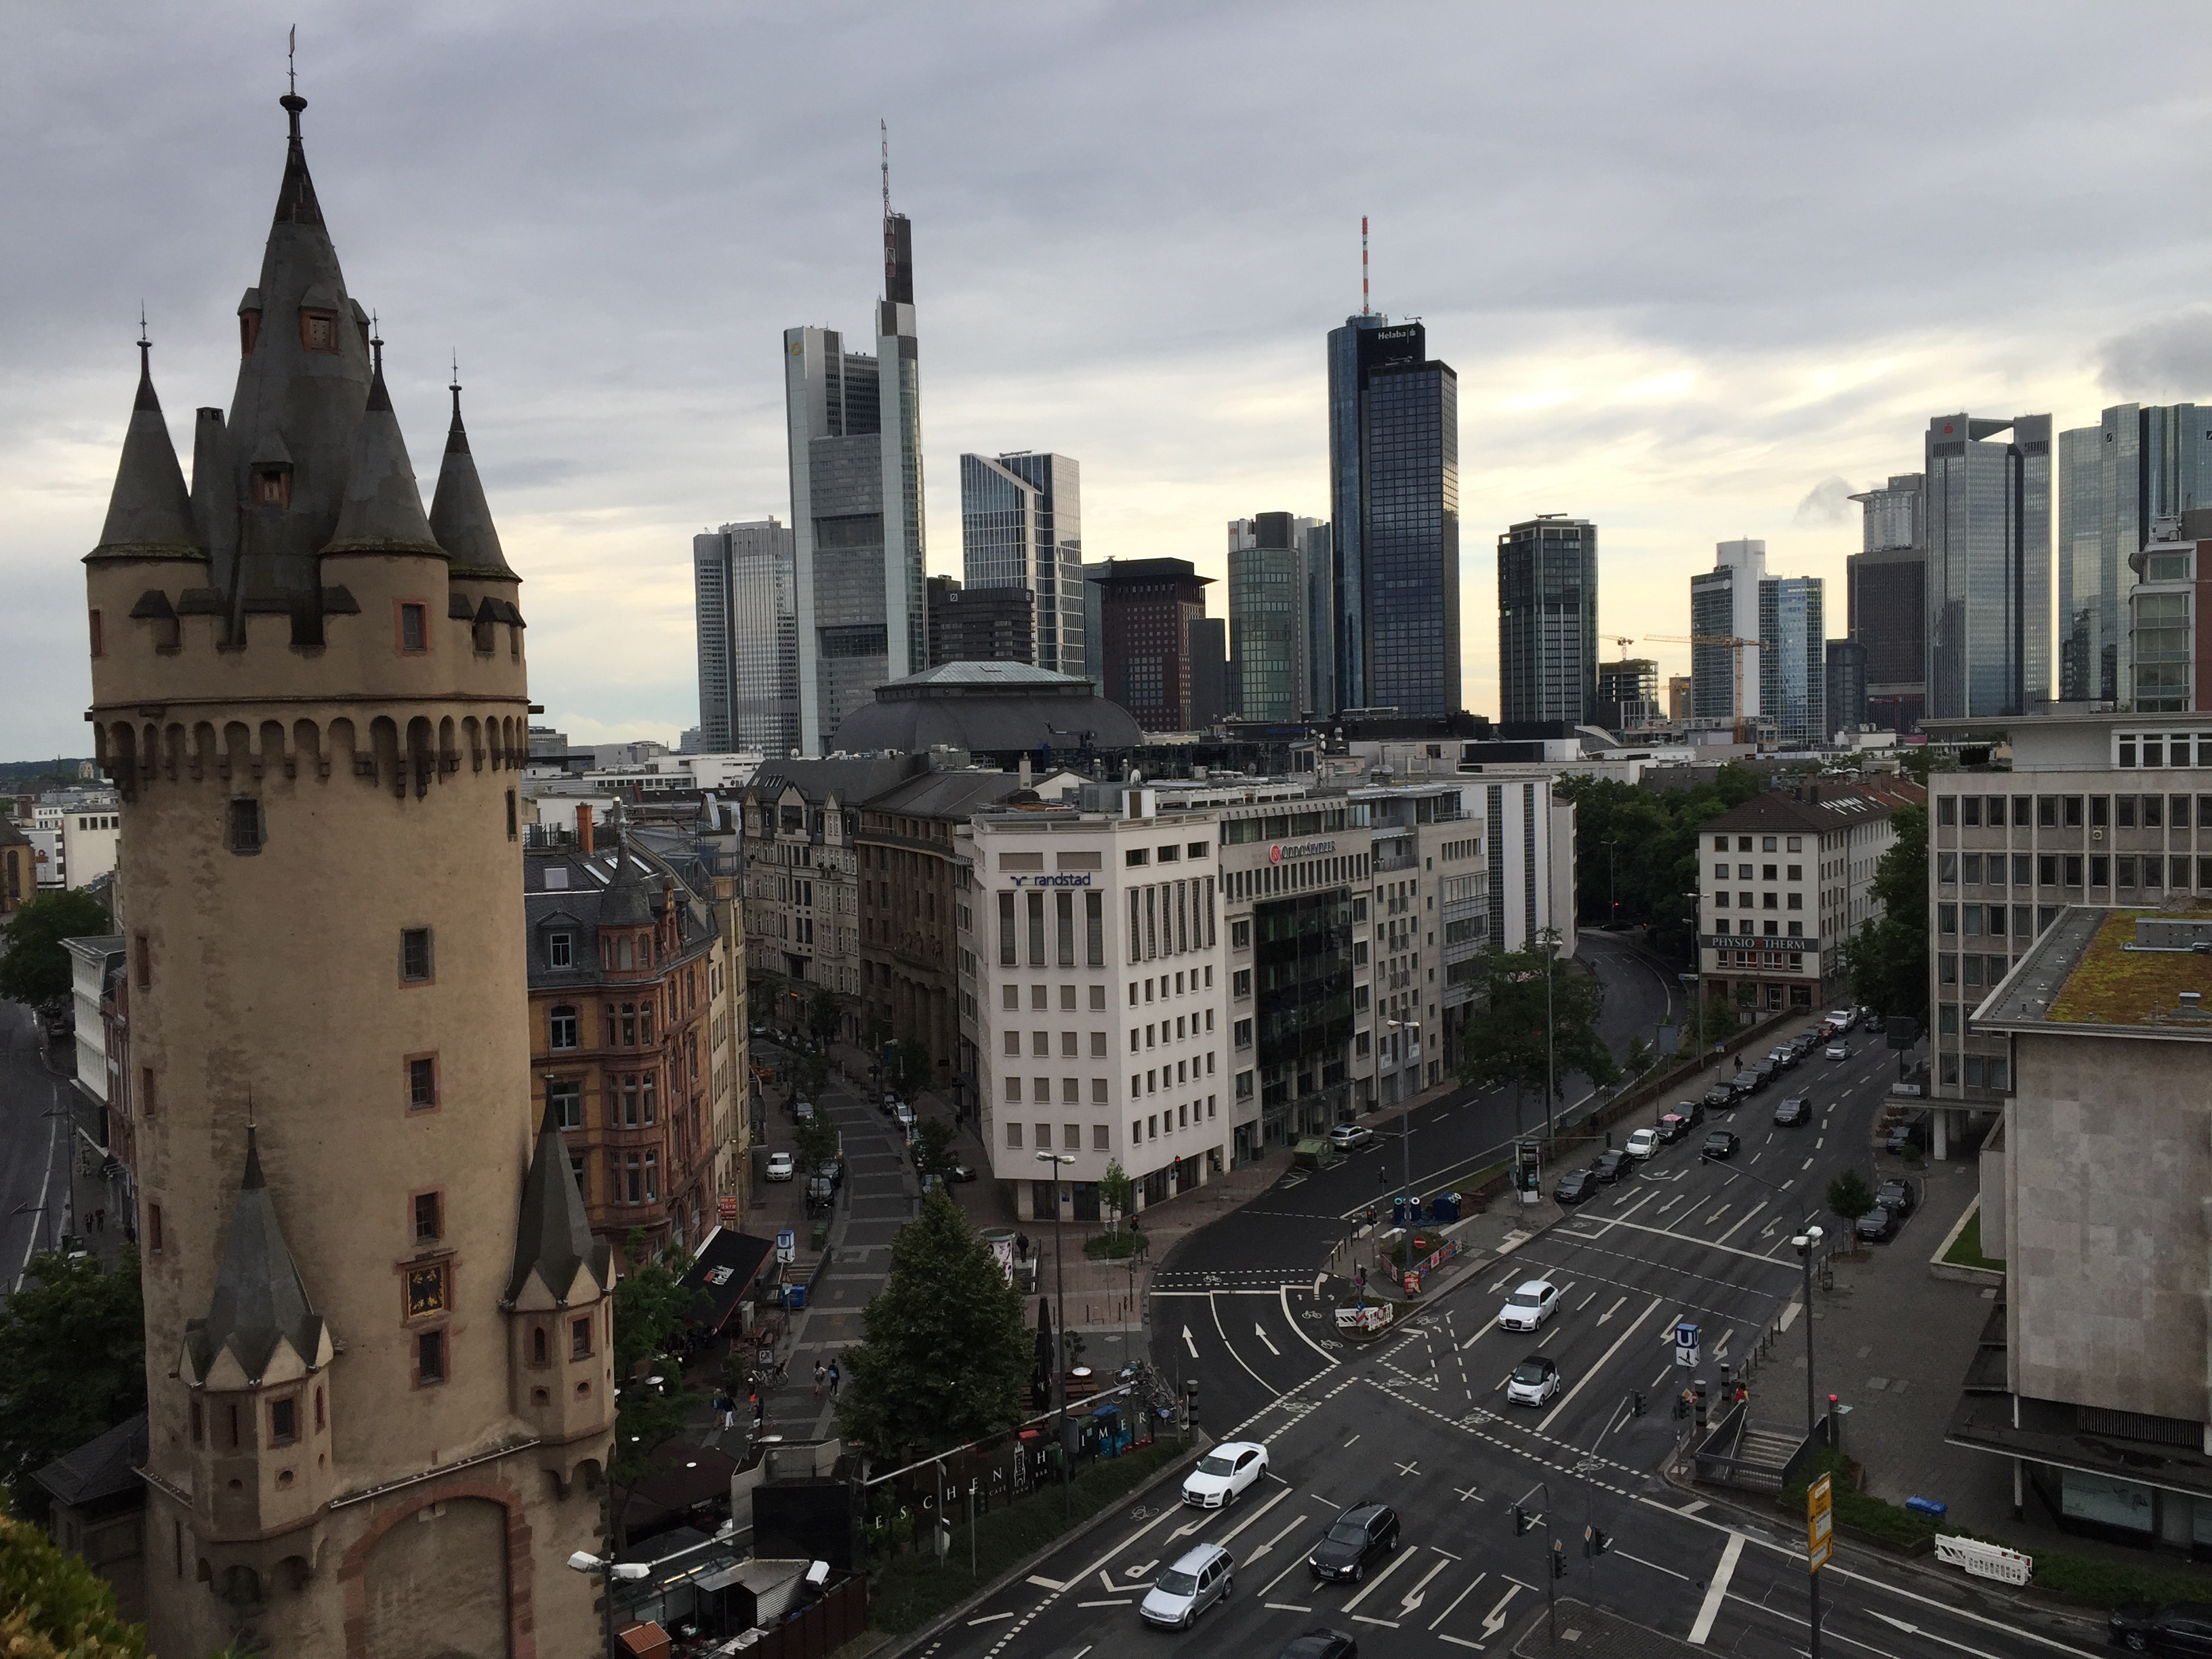 Turm Hotel Frankfurt Telefon